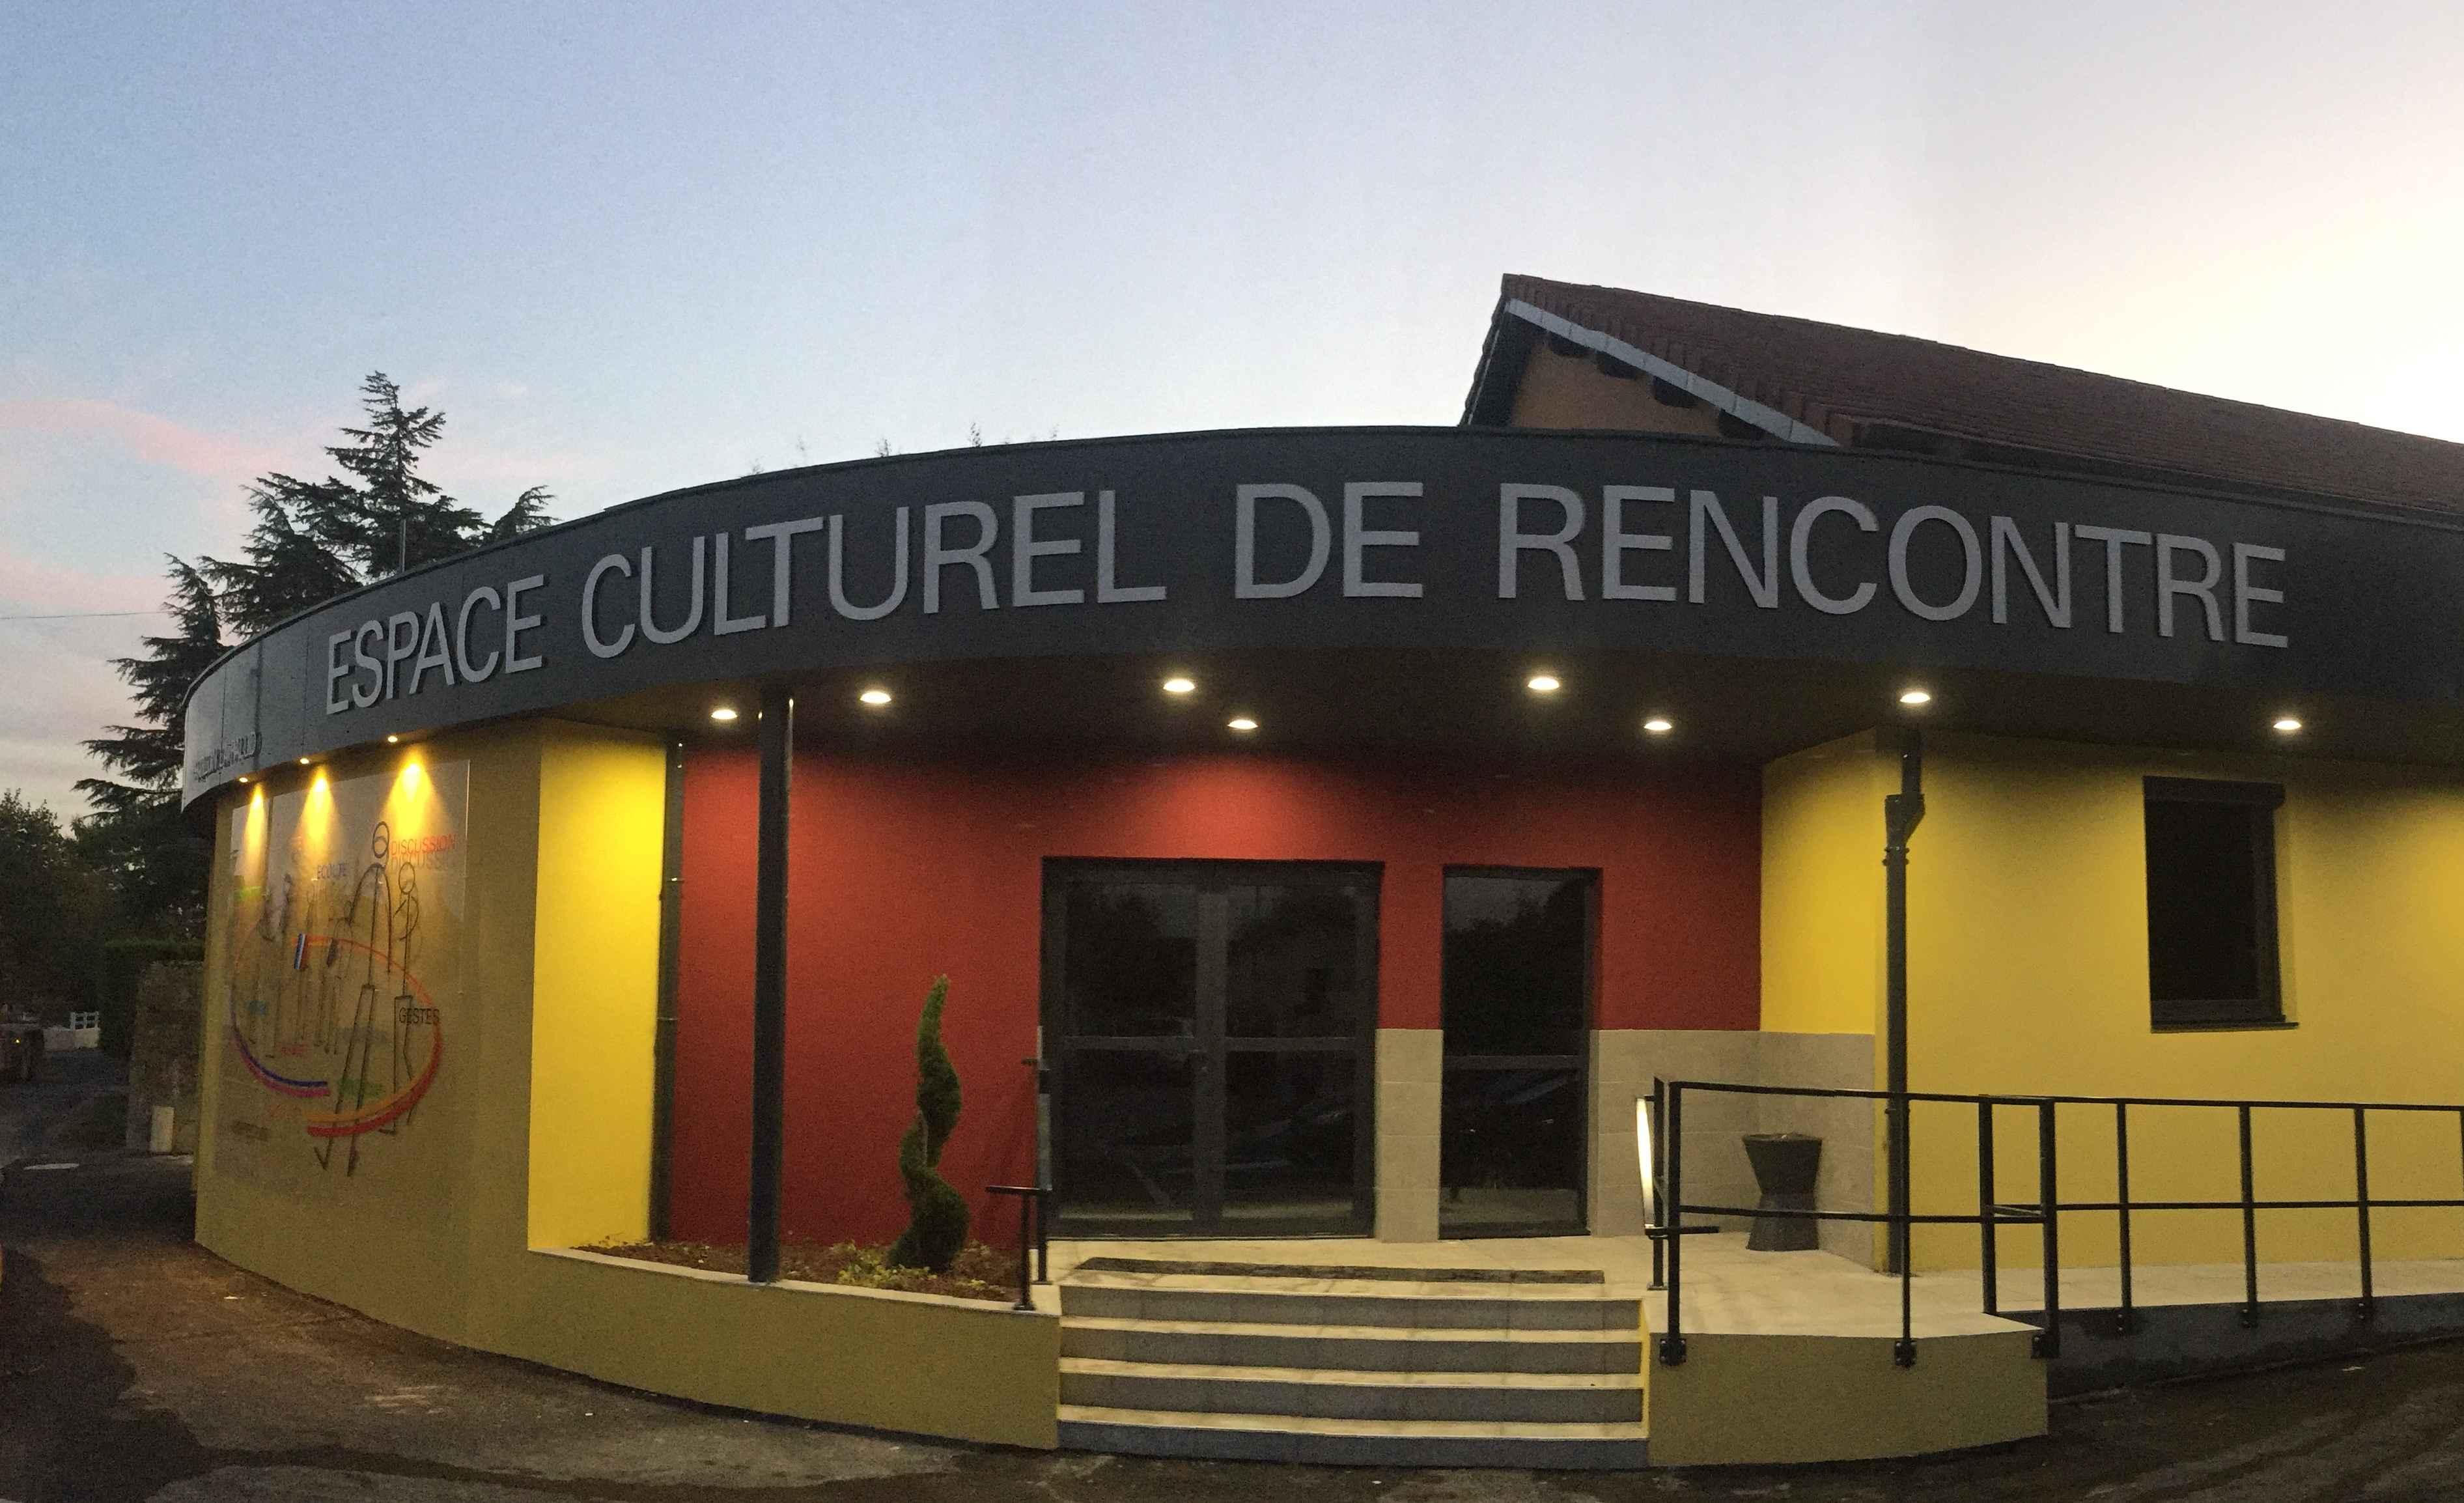 Site de rencontre culturel